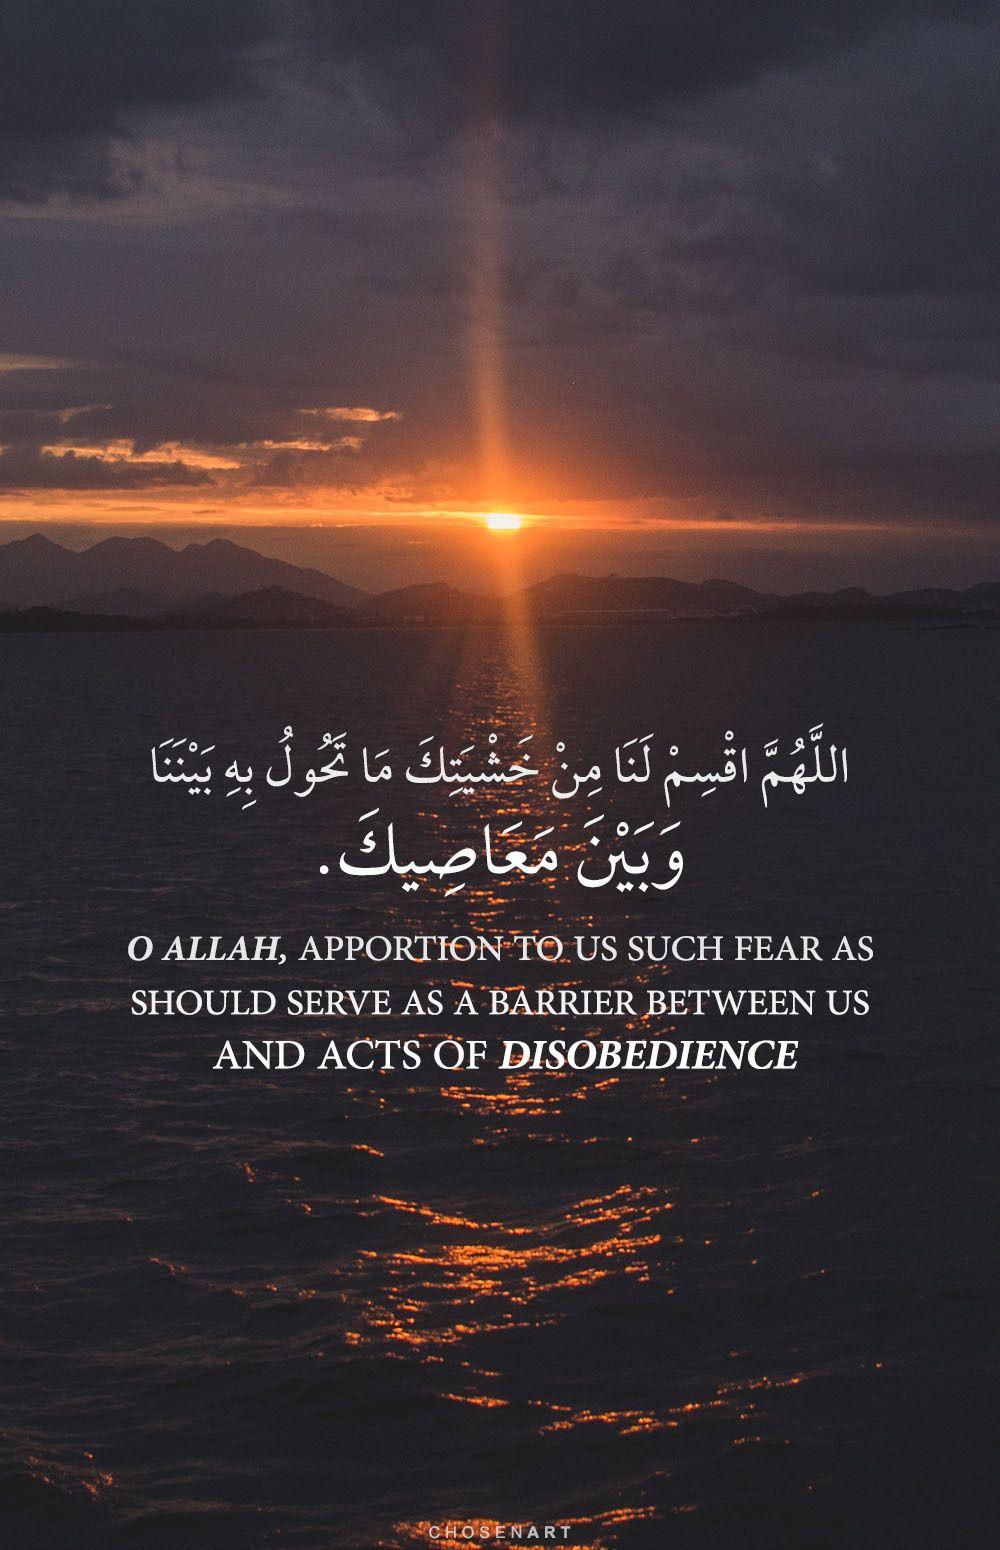 Nader Dawah ومن طاعتك ما تبلغنا به جنتك ومن اليقين ما تهون به Quran Quotes Quran Quotes Verses Quran Quotes Inspirational